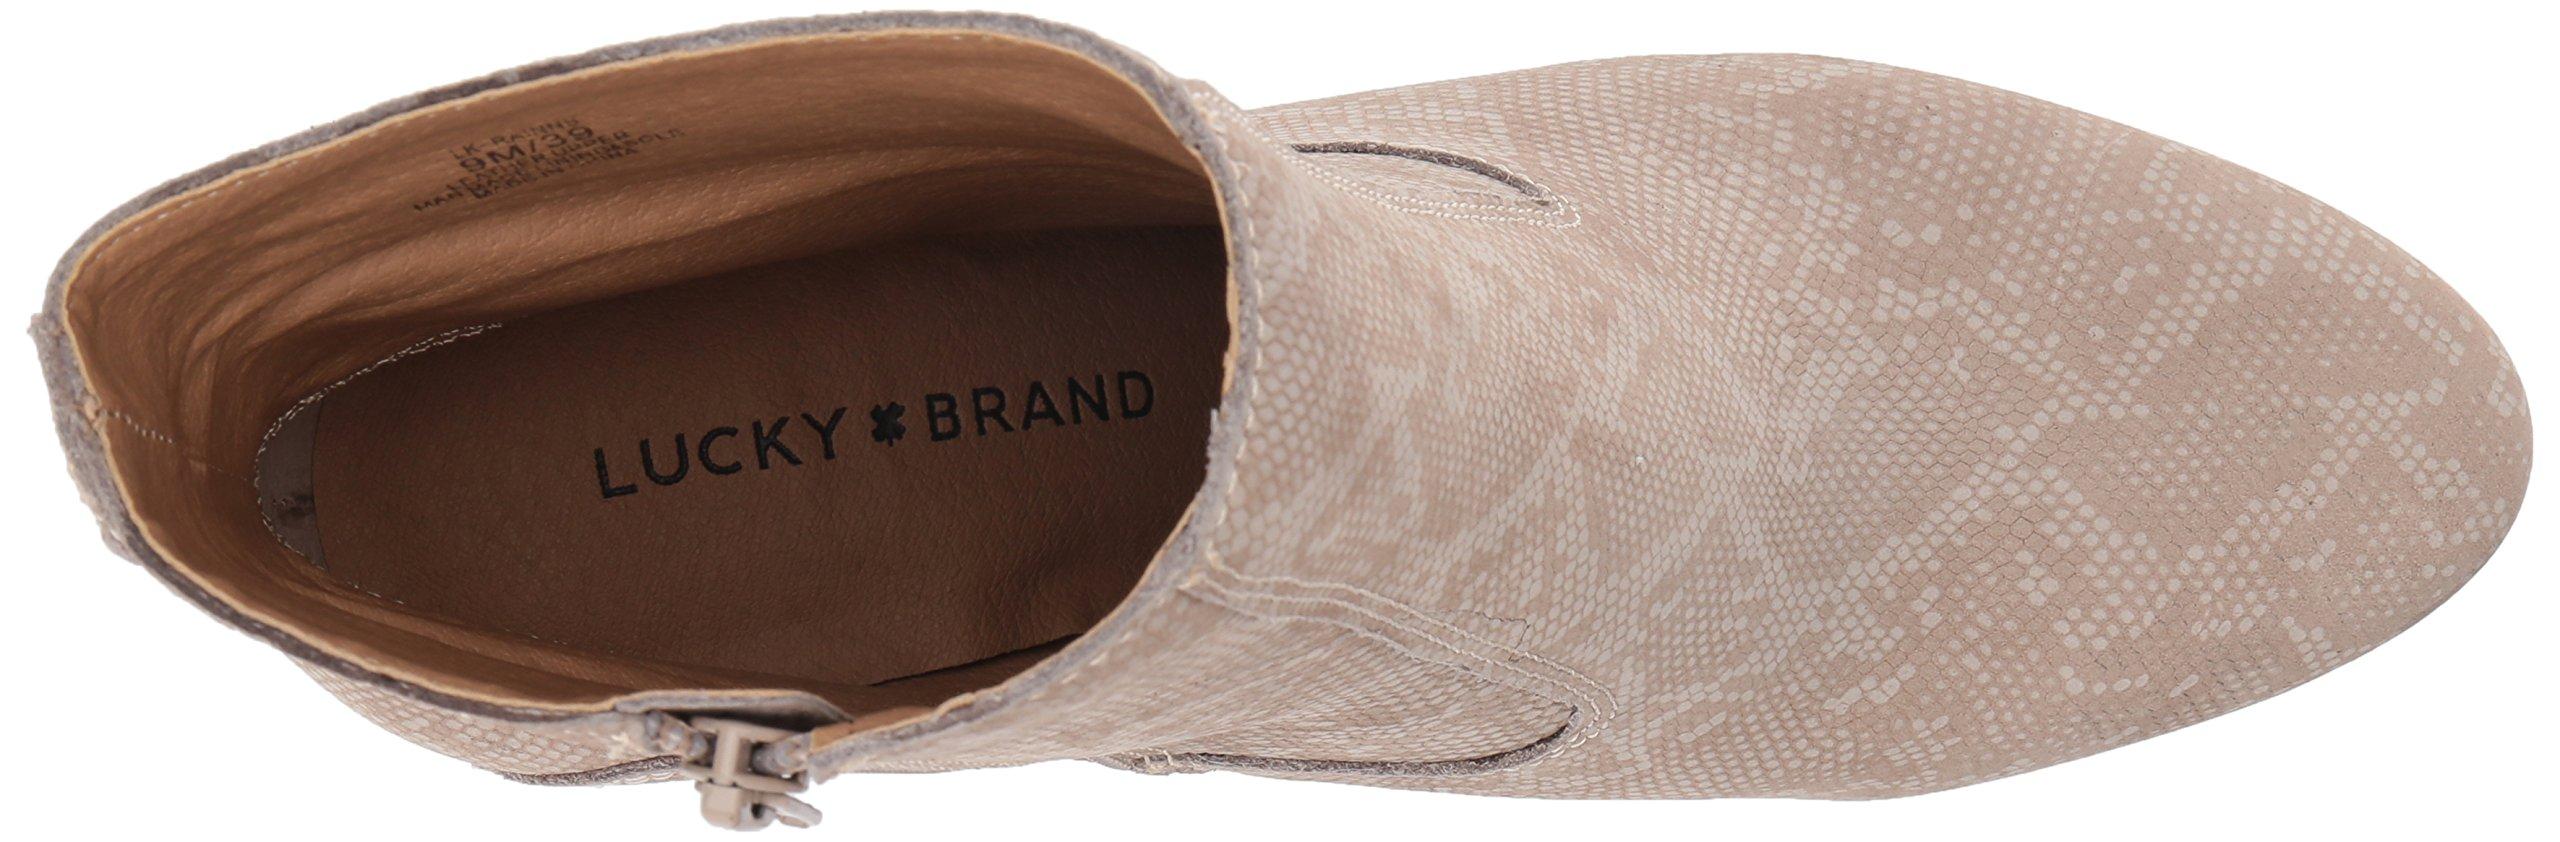 Lucky Brand Women's Rainns Ankle Boot by Lucky Brand (Image #8)